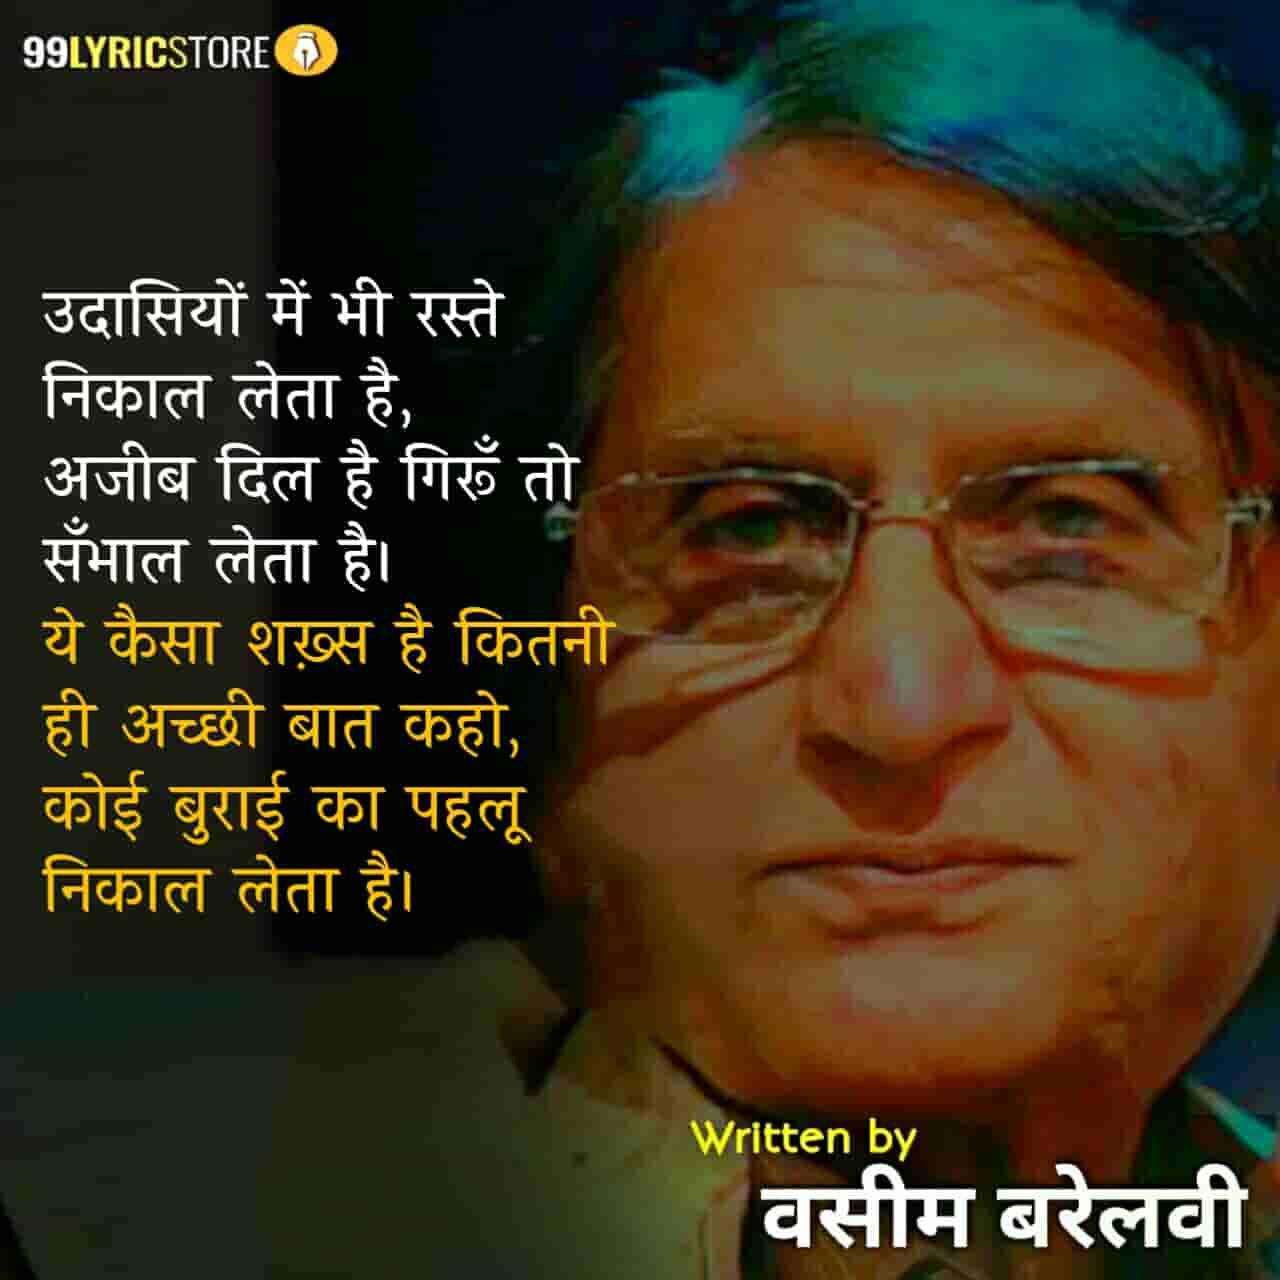 This beautiful ghazal Udaasiyon Mein Bhi Raste Nikaal Leta Hai has written by Waseem Barelvi.